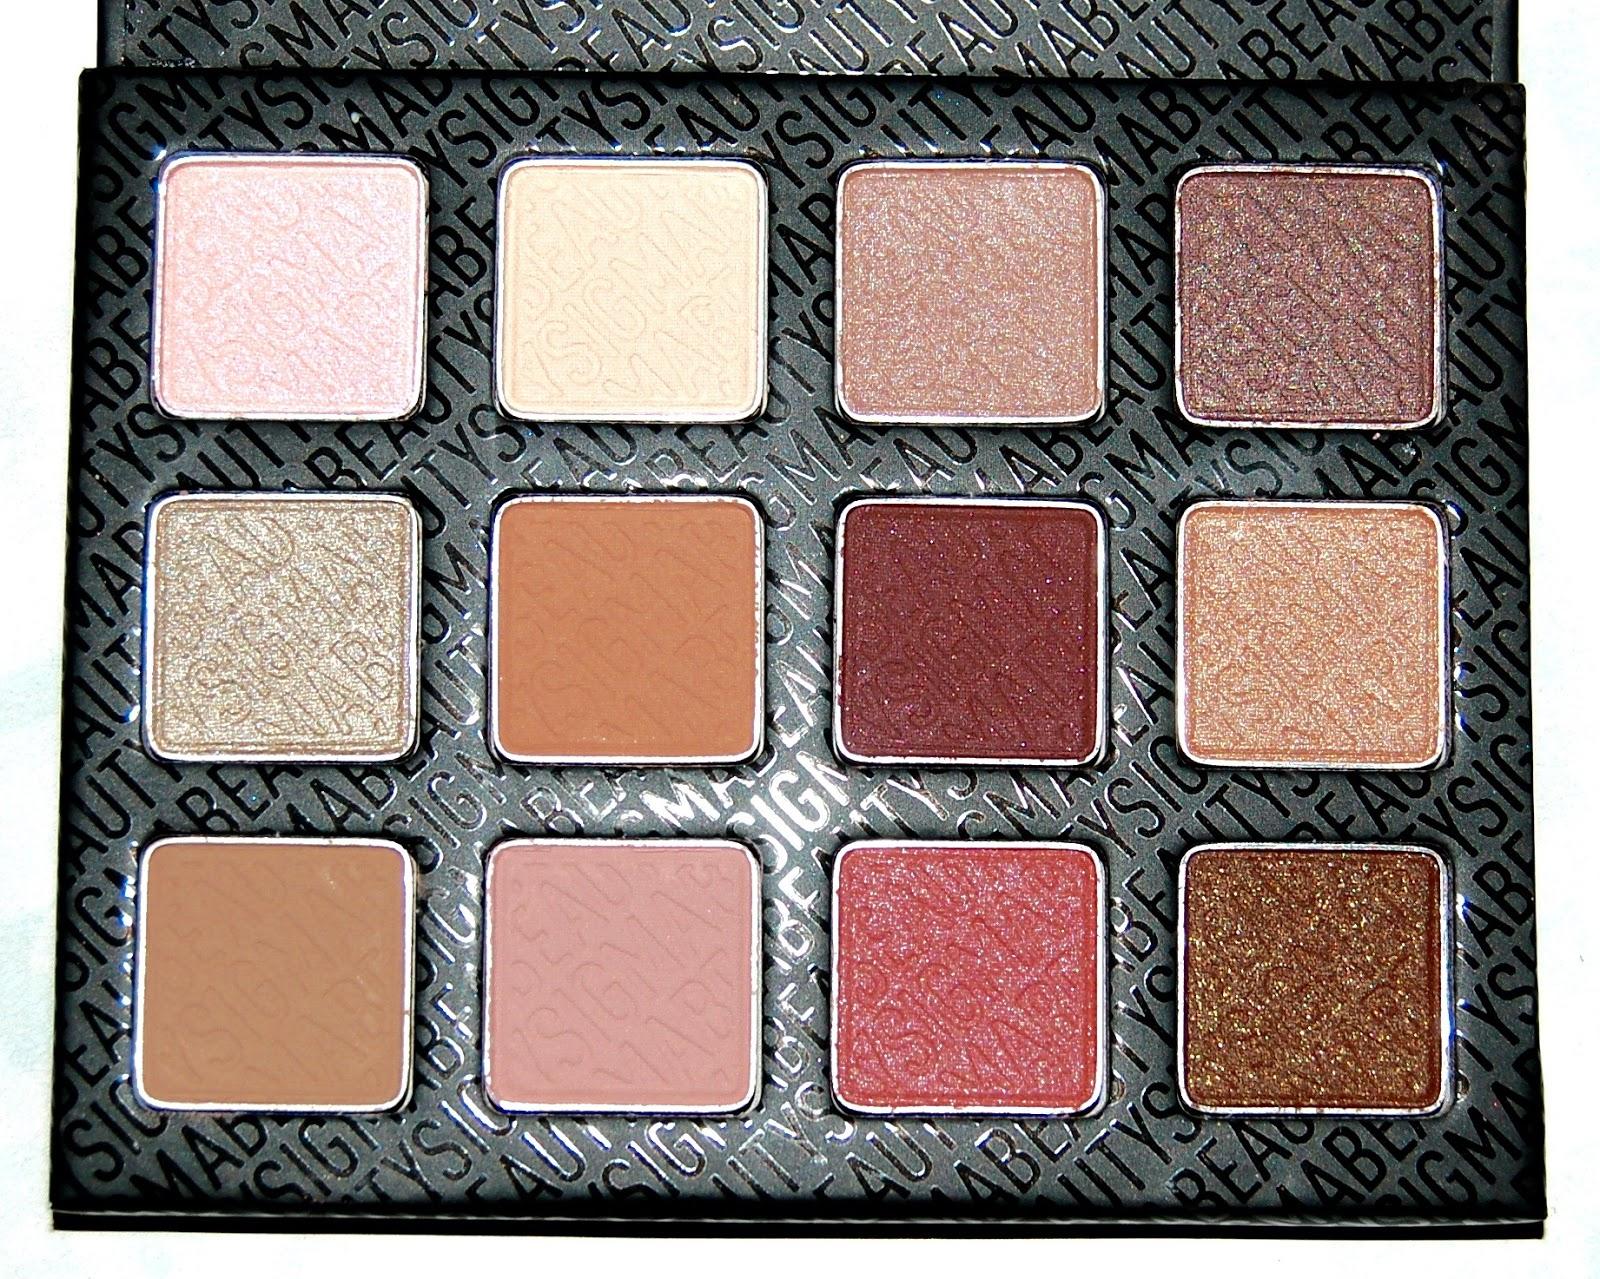 Sigma Warm Neutrals Eye Shadow Palette Review The